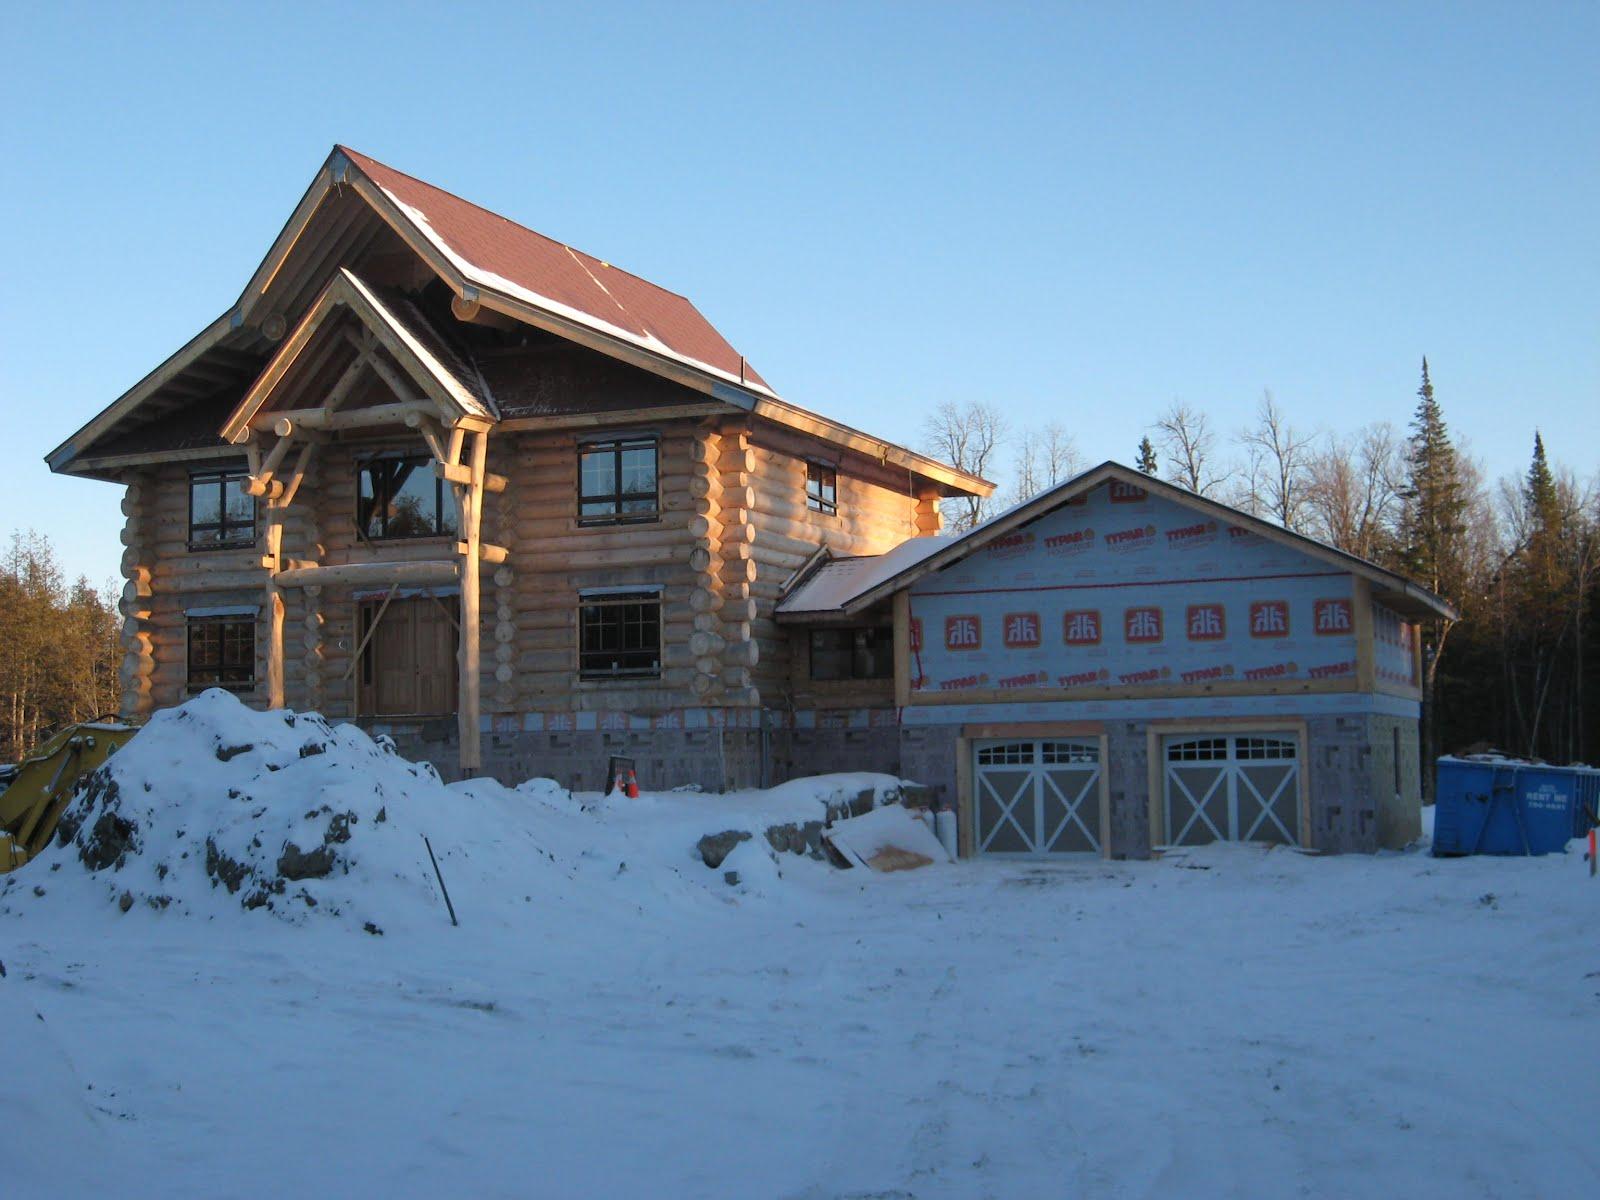 Dextor a edwards architect juneau log home carp ontario for Log home architects